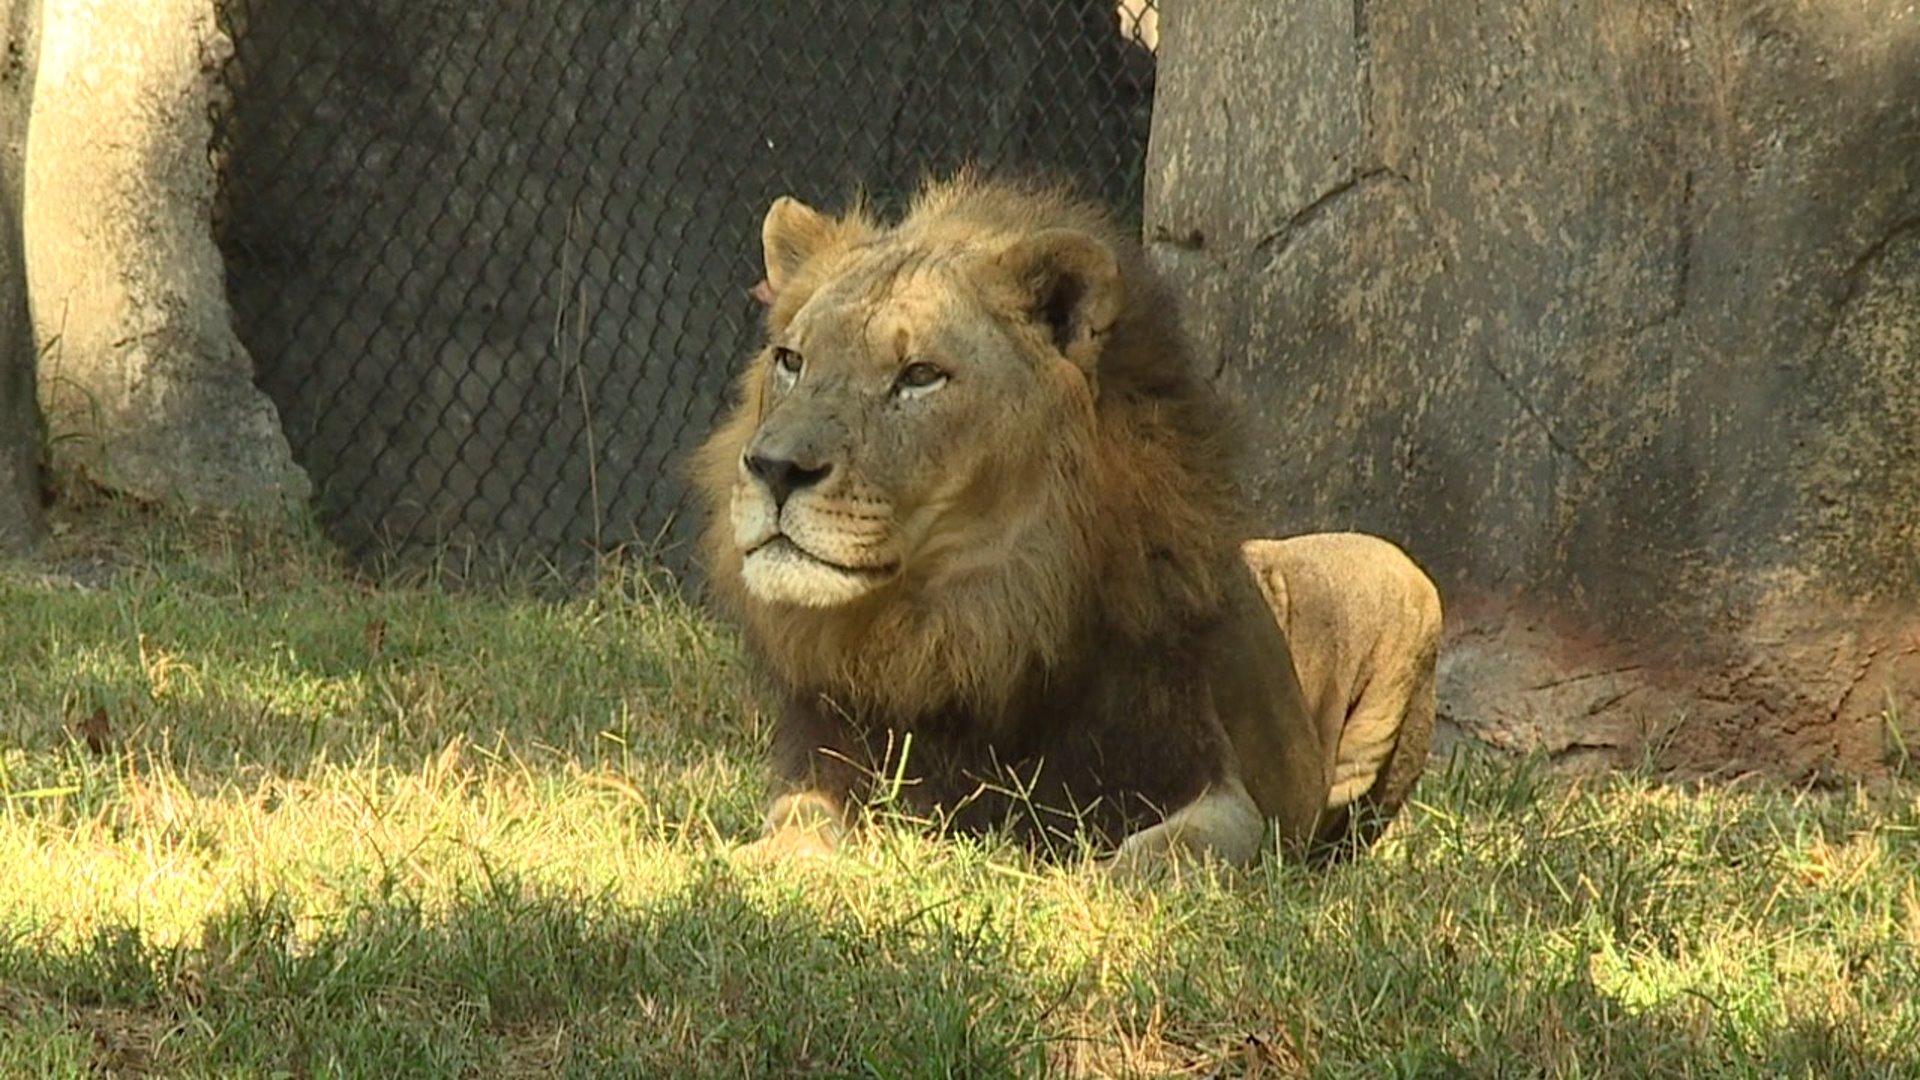 Nc Zoo S Riley The Lion Hits An Astounding 20 Years Old Myfox8 Com